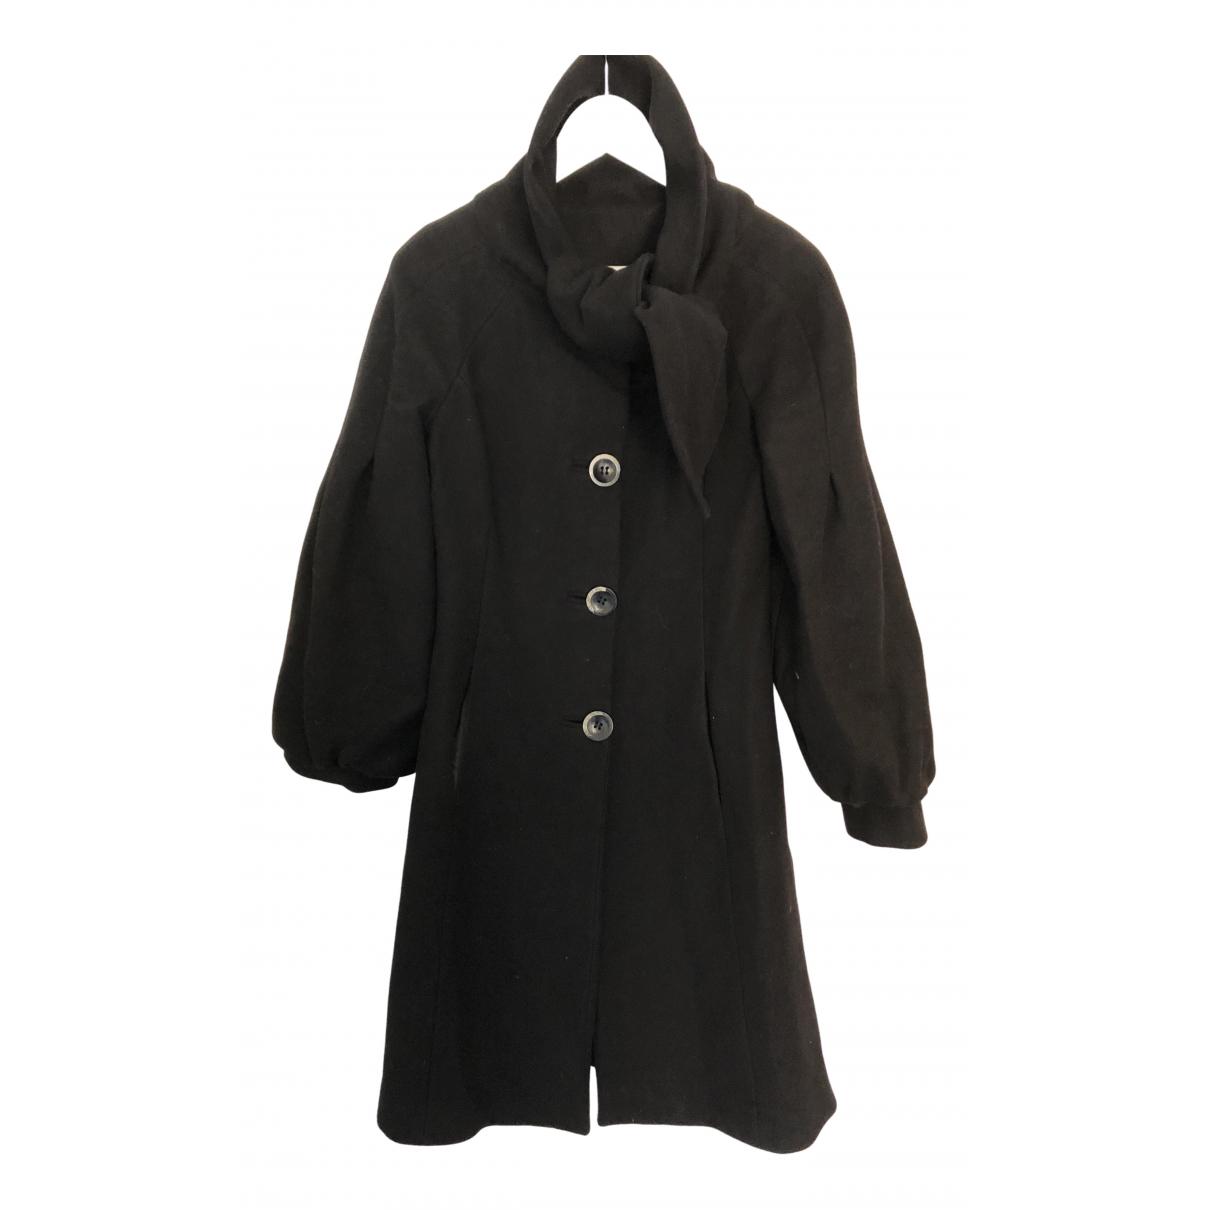 Alberta Ferretti \N Black Wool coat for Women 40 IT